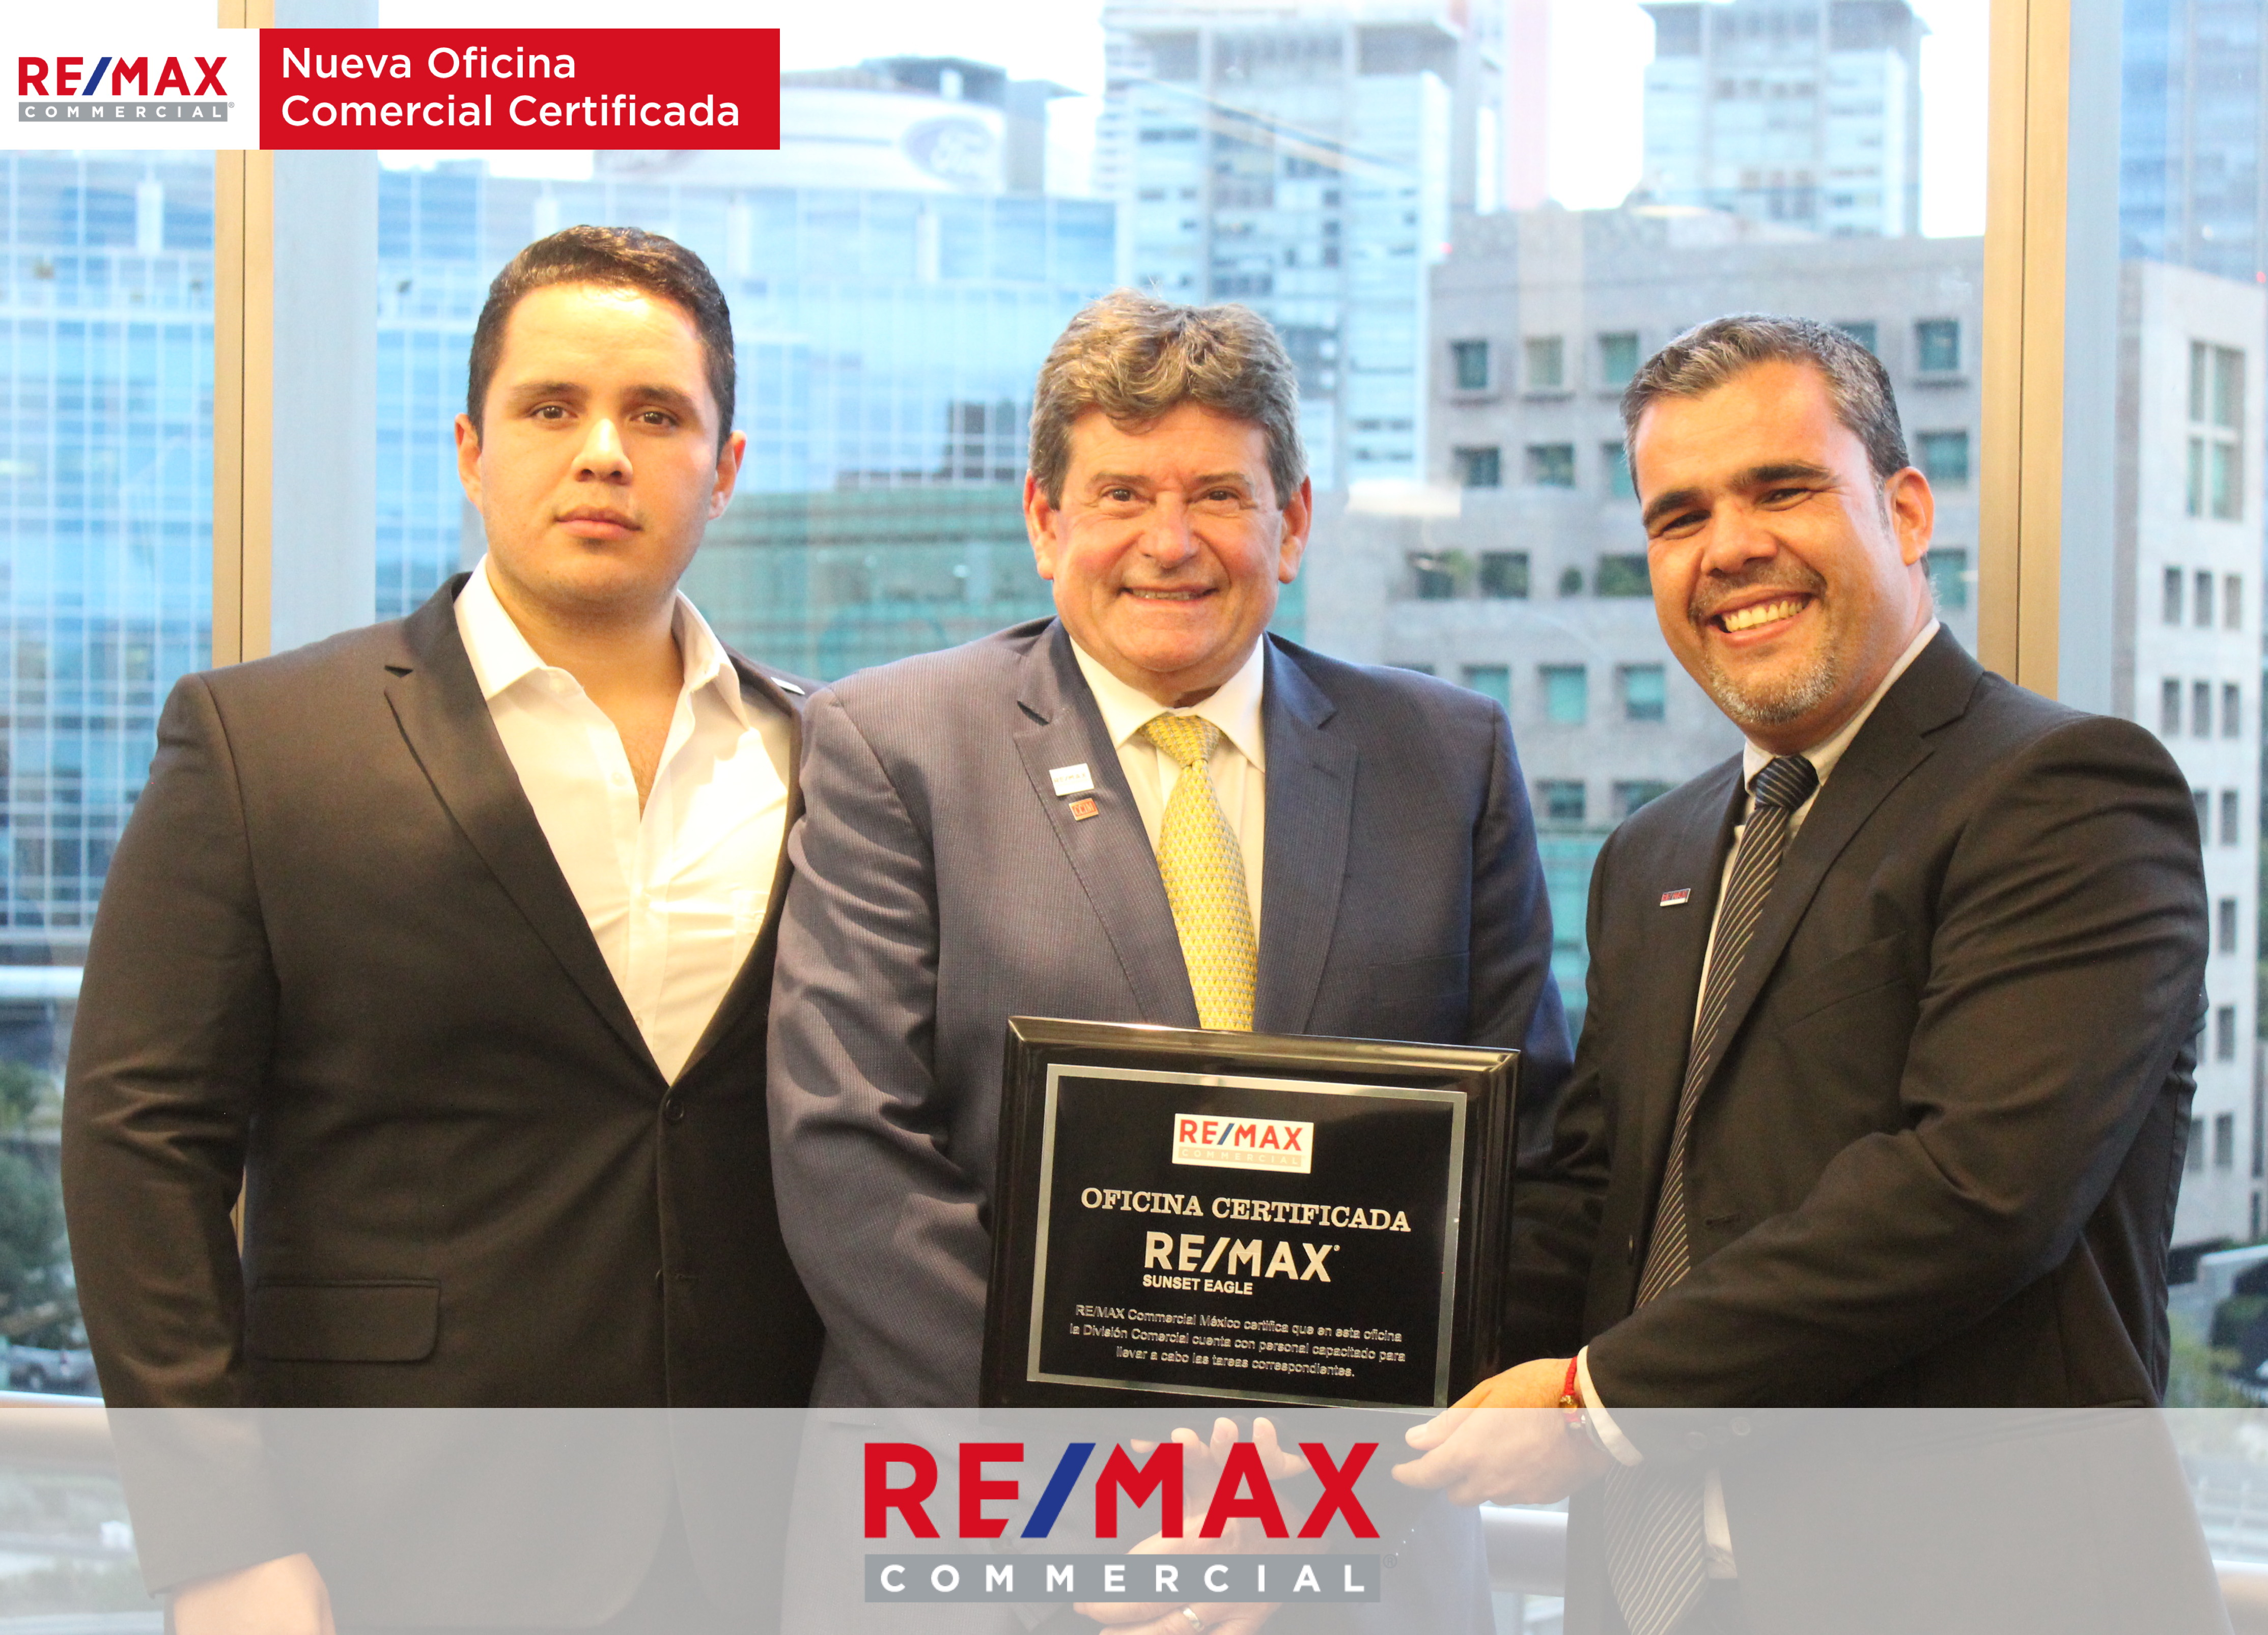 30_Certificacion_comercial_comprar_rentar_vender_casa_departamento_franquicias_inmobiliarias_REMAX_mexico_propiedades_comerciales_terrenos_bodegas